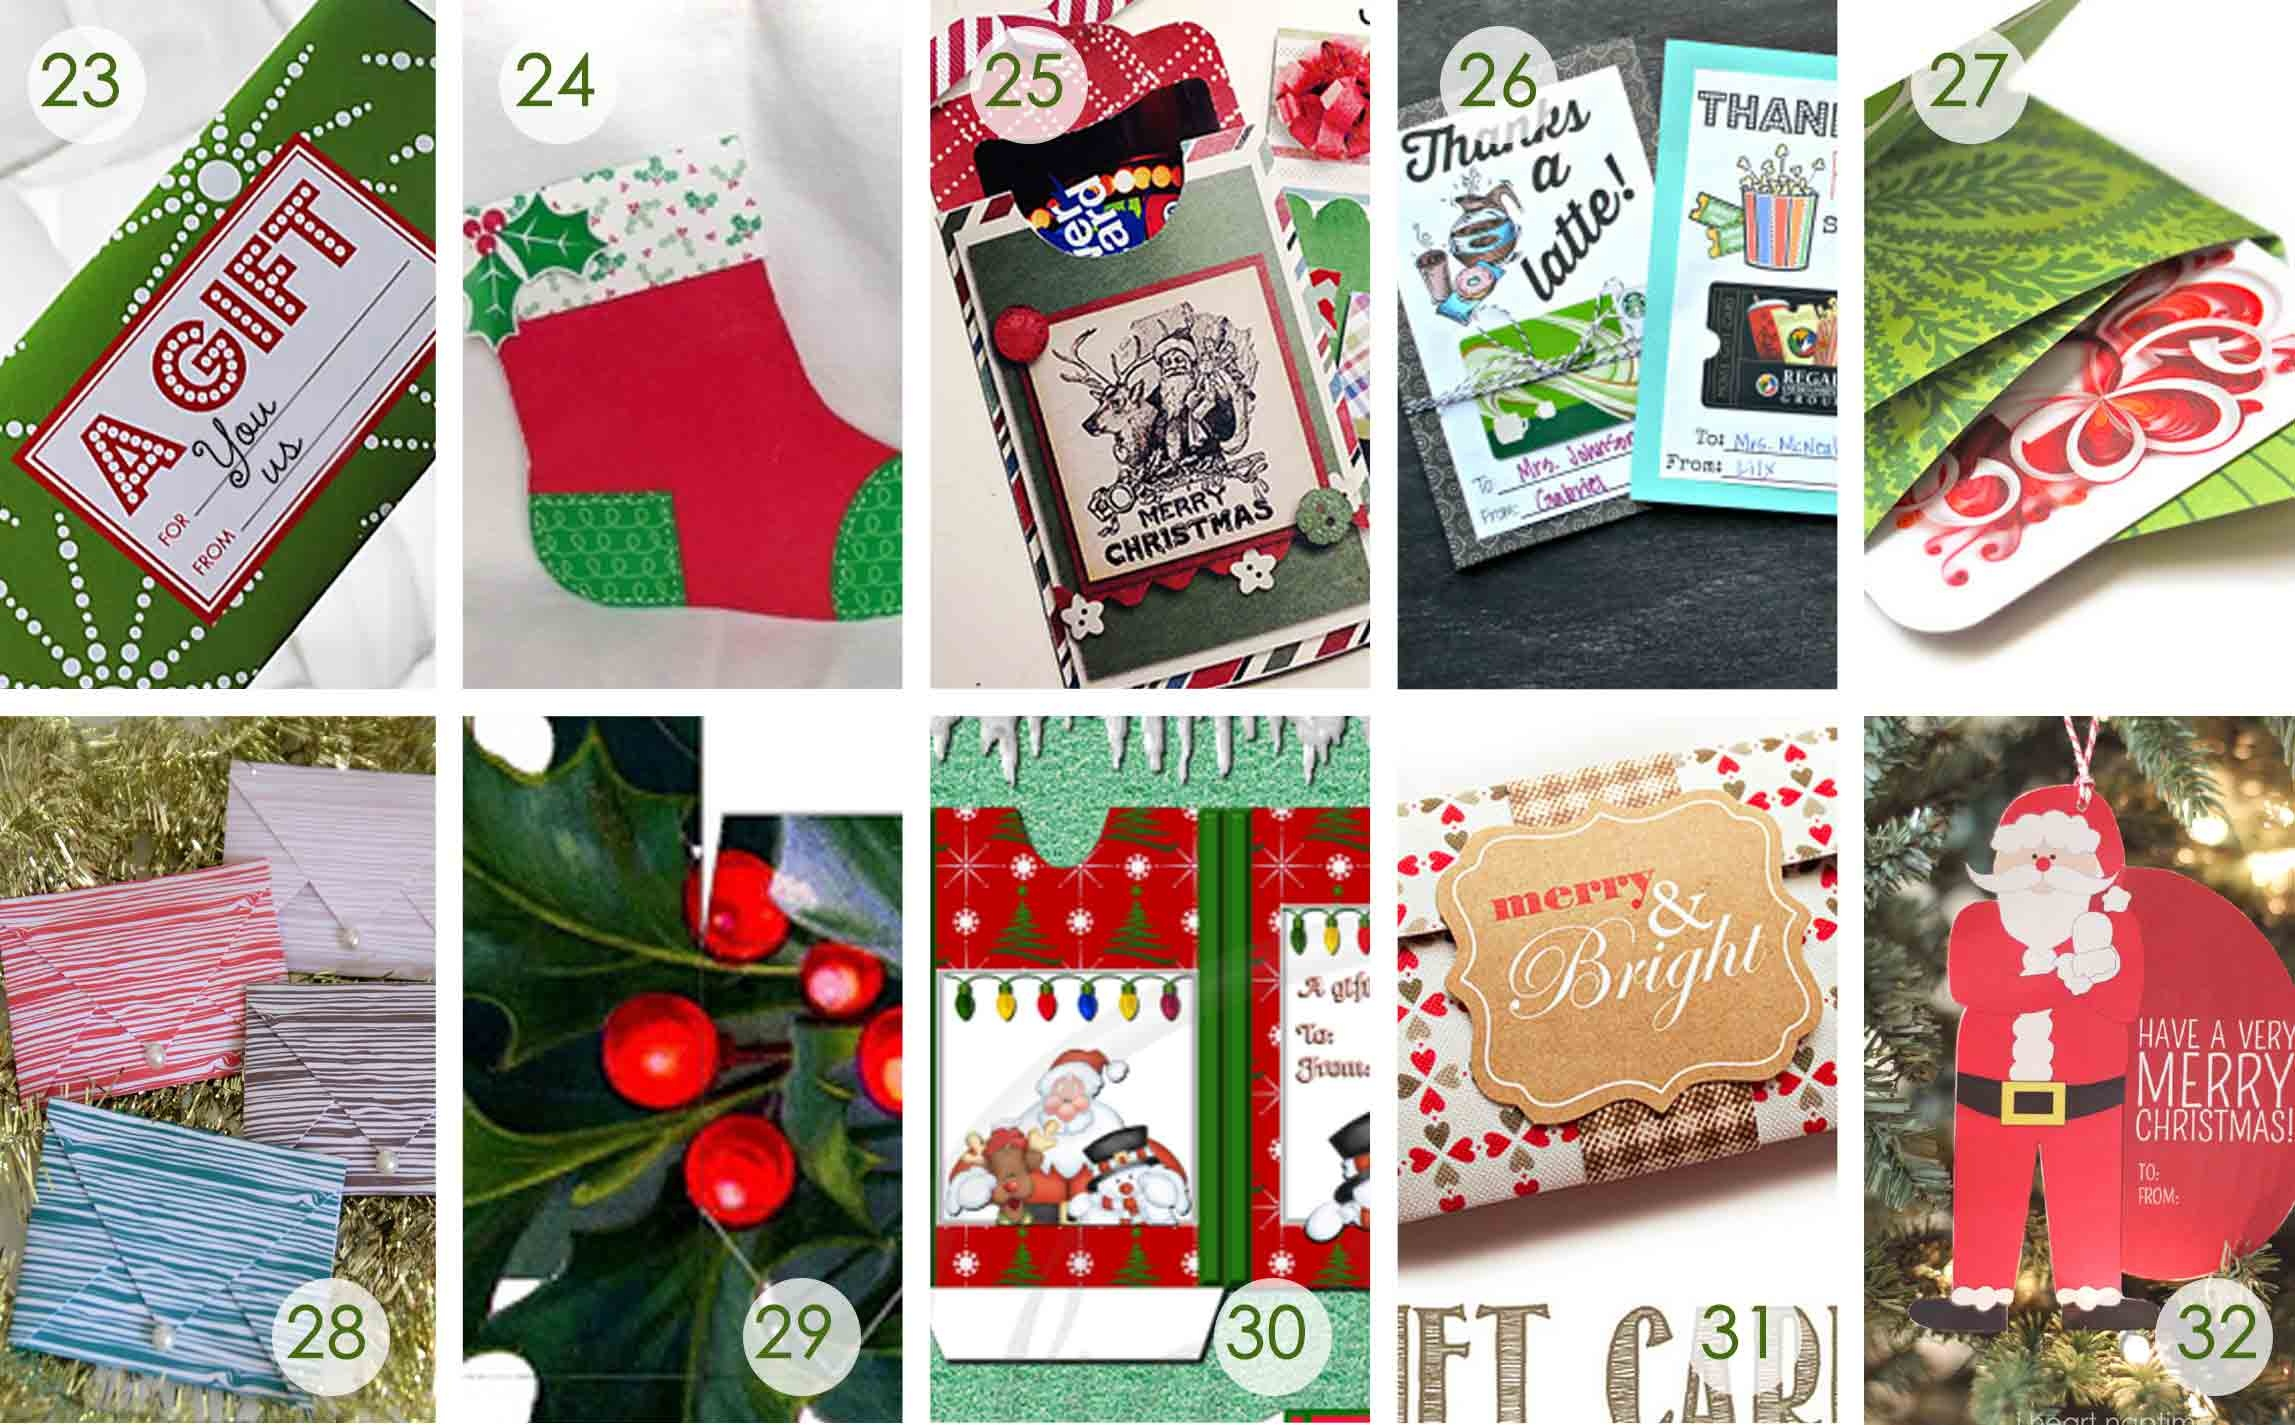 Over 50 Printable Gift Card Holders For The Holidays   Gcg - Make A Holiday Card For Free Printable